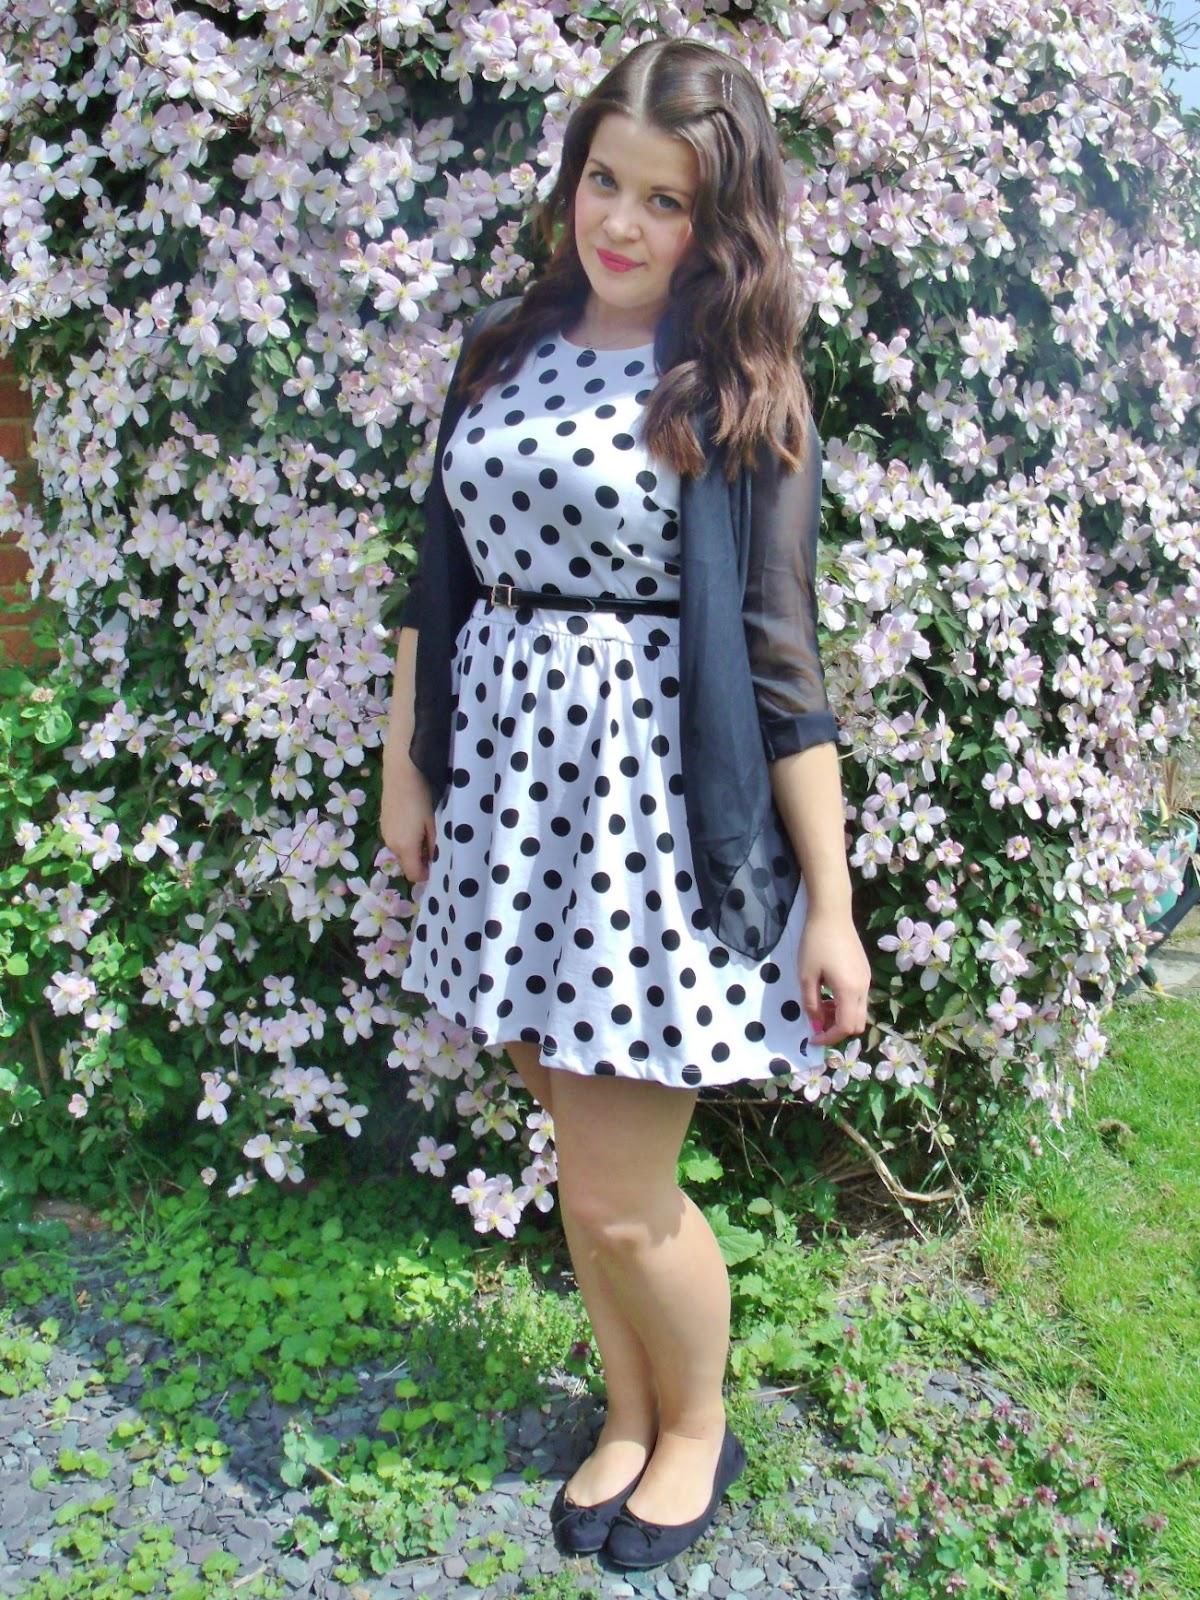 The Kate Middleton Polka Dot Dress Dupe